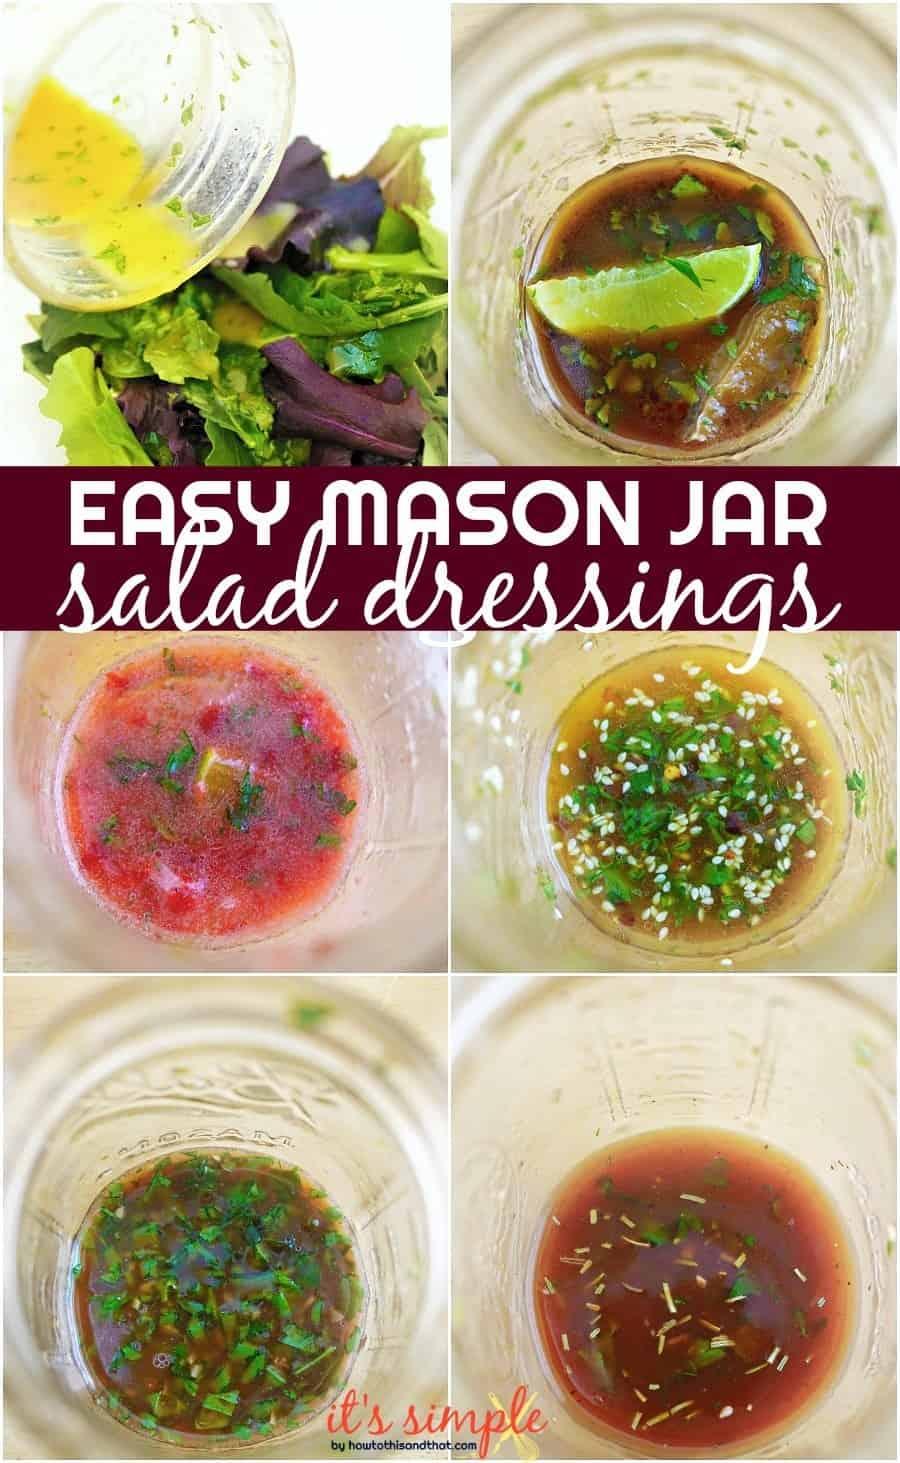 easy vinaigrette recipes